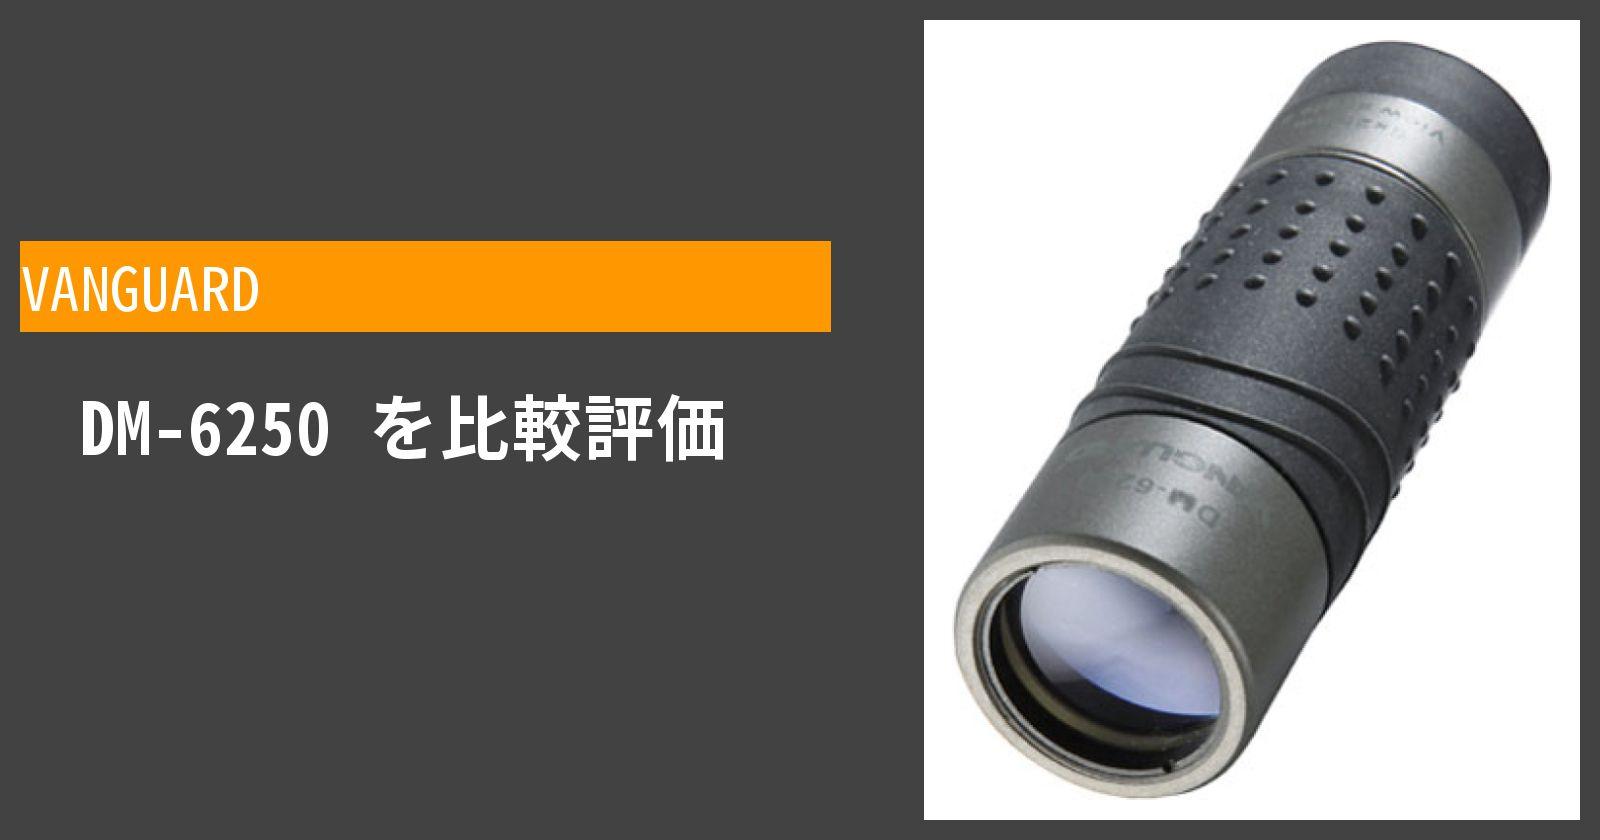 DM-6250を徹底評価